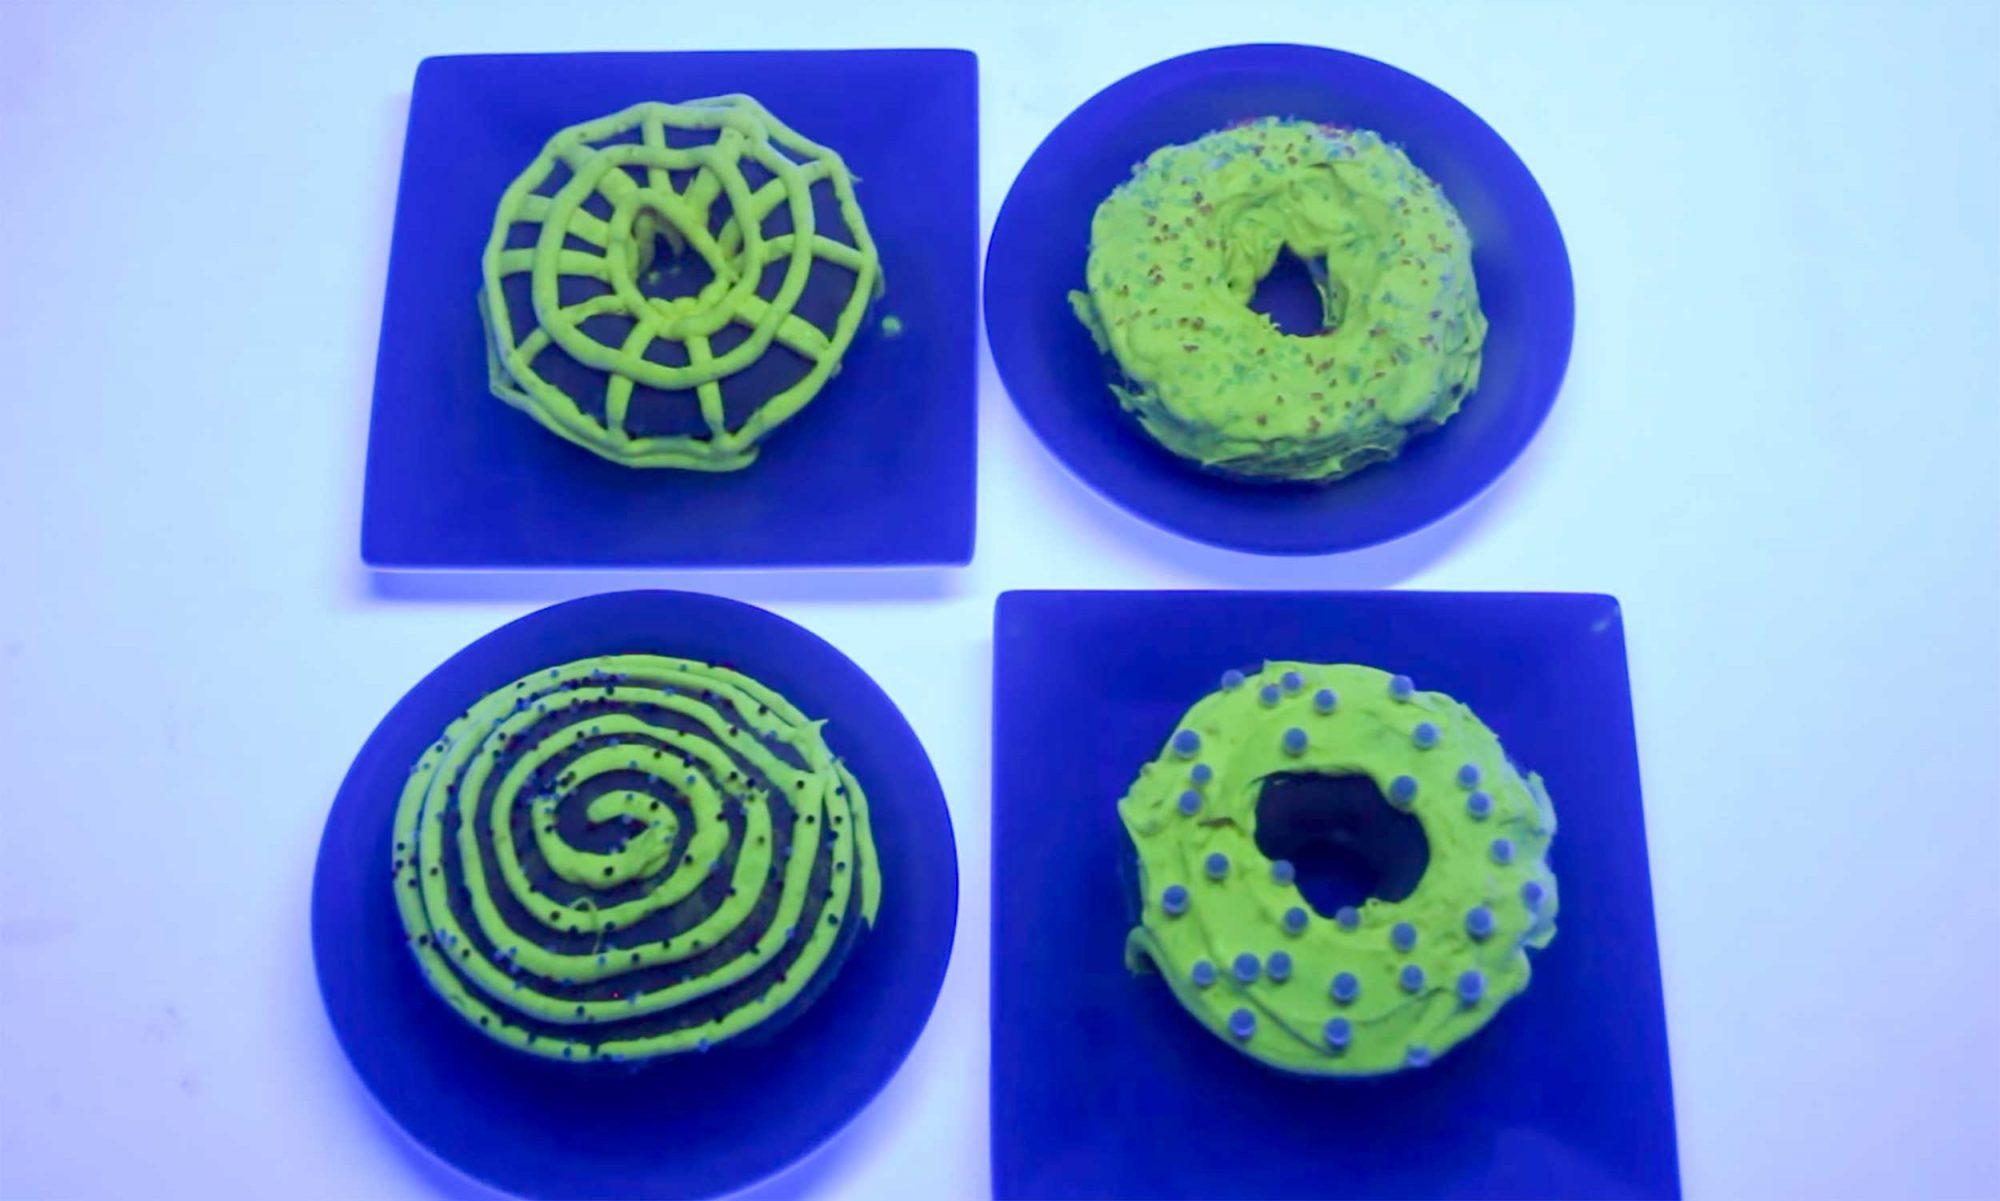 EC: DIY Glow-in-the-Dark Doughnuts Are Taking Over YouTube